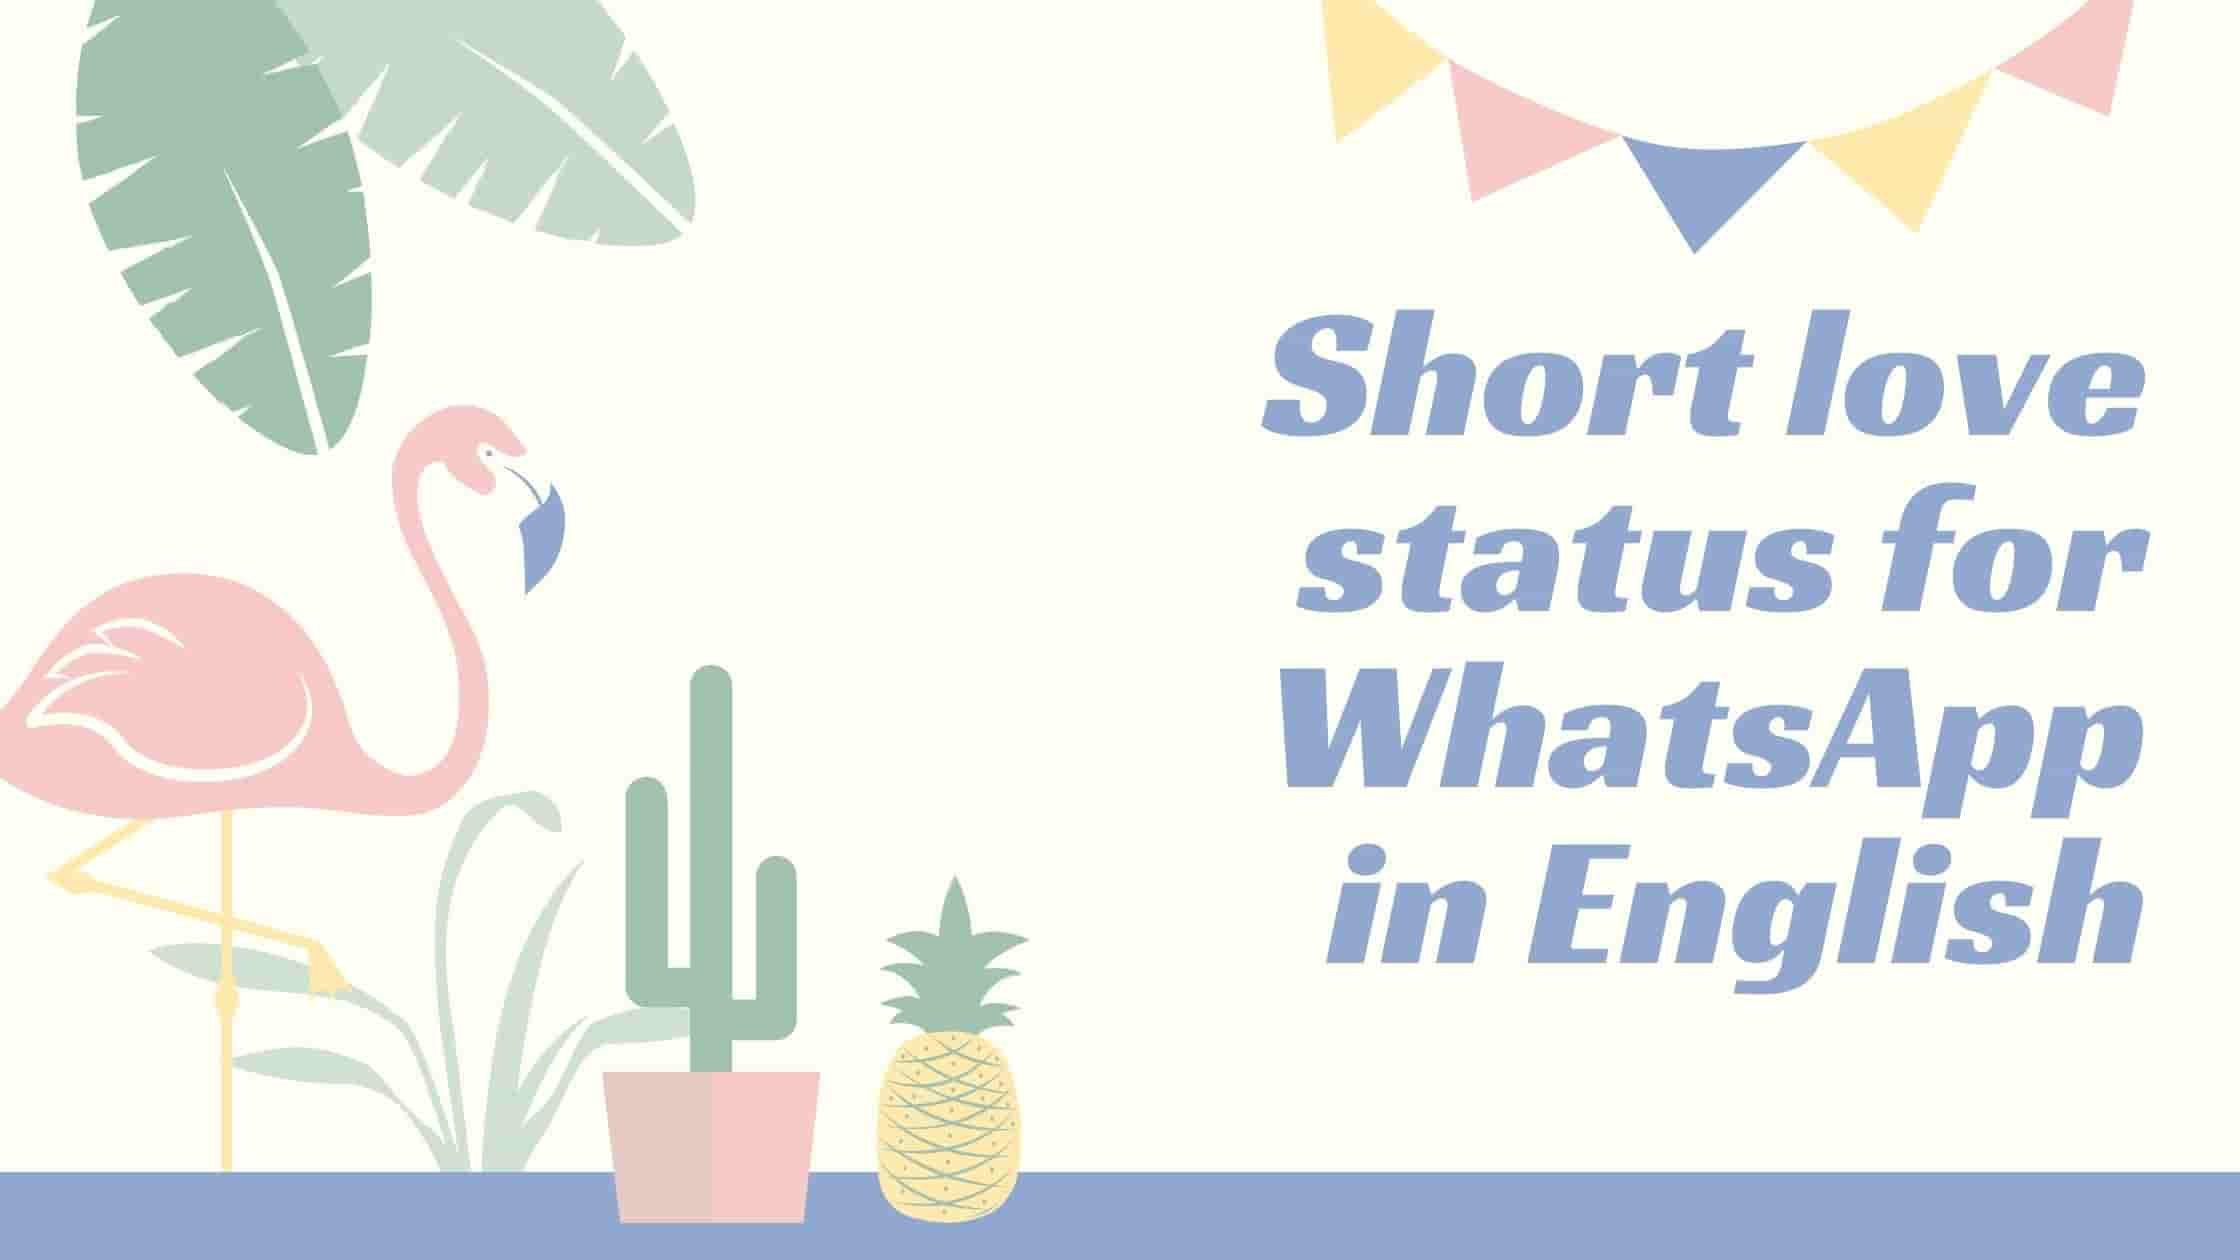 Short love status for WhatsApp in English